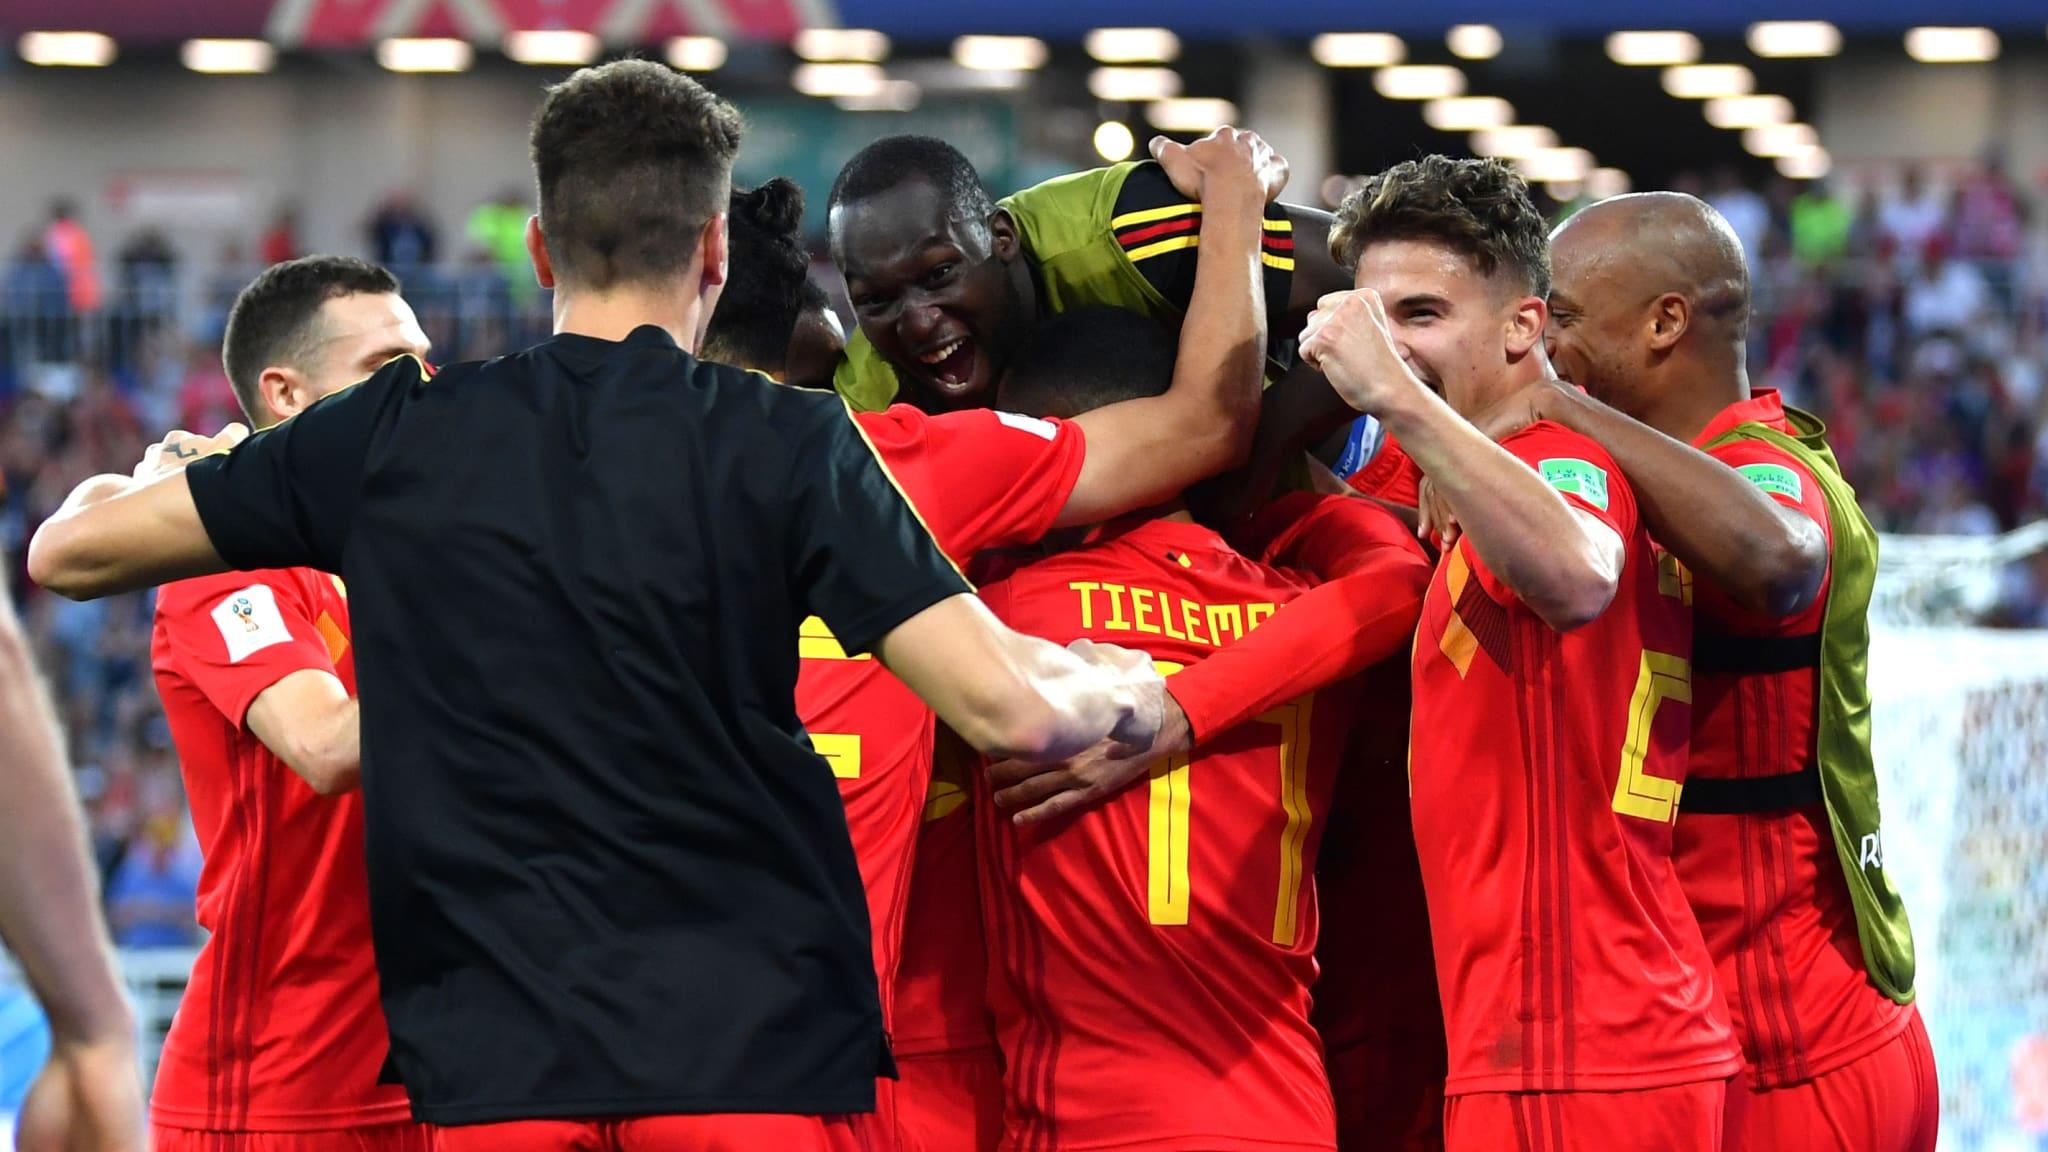 FIFA, World Cup, 2018,Belgium, England, Group G, Sports, Football, NewsMobile, Mobile News, India